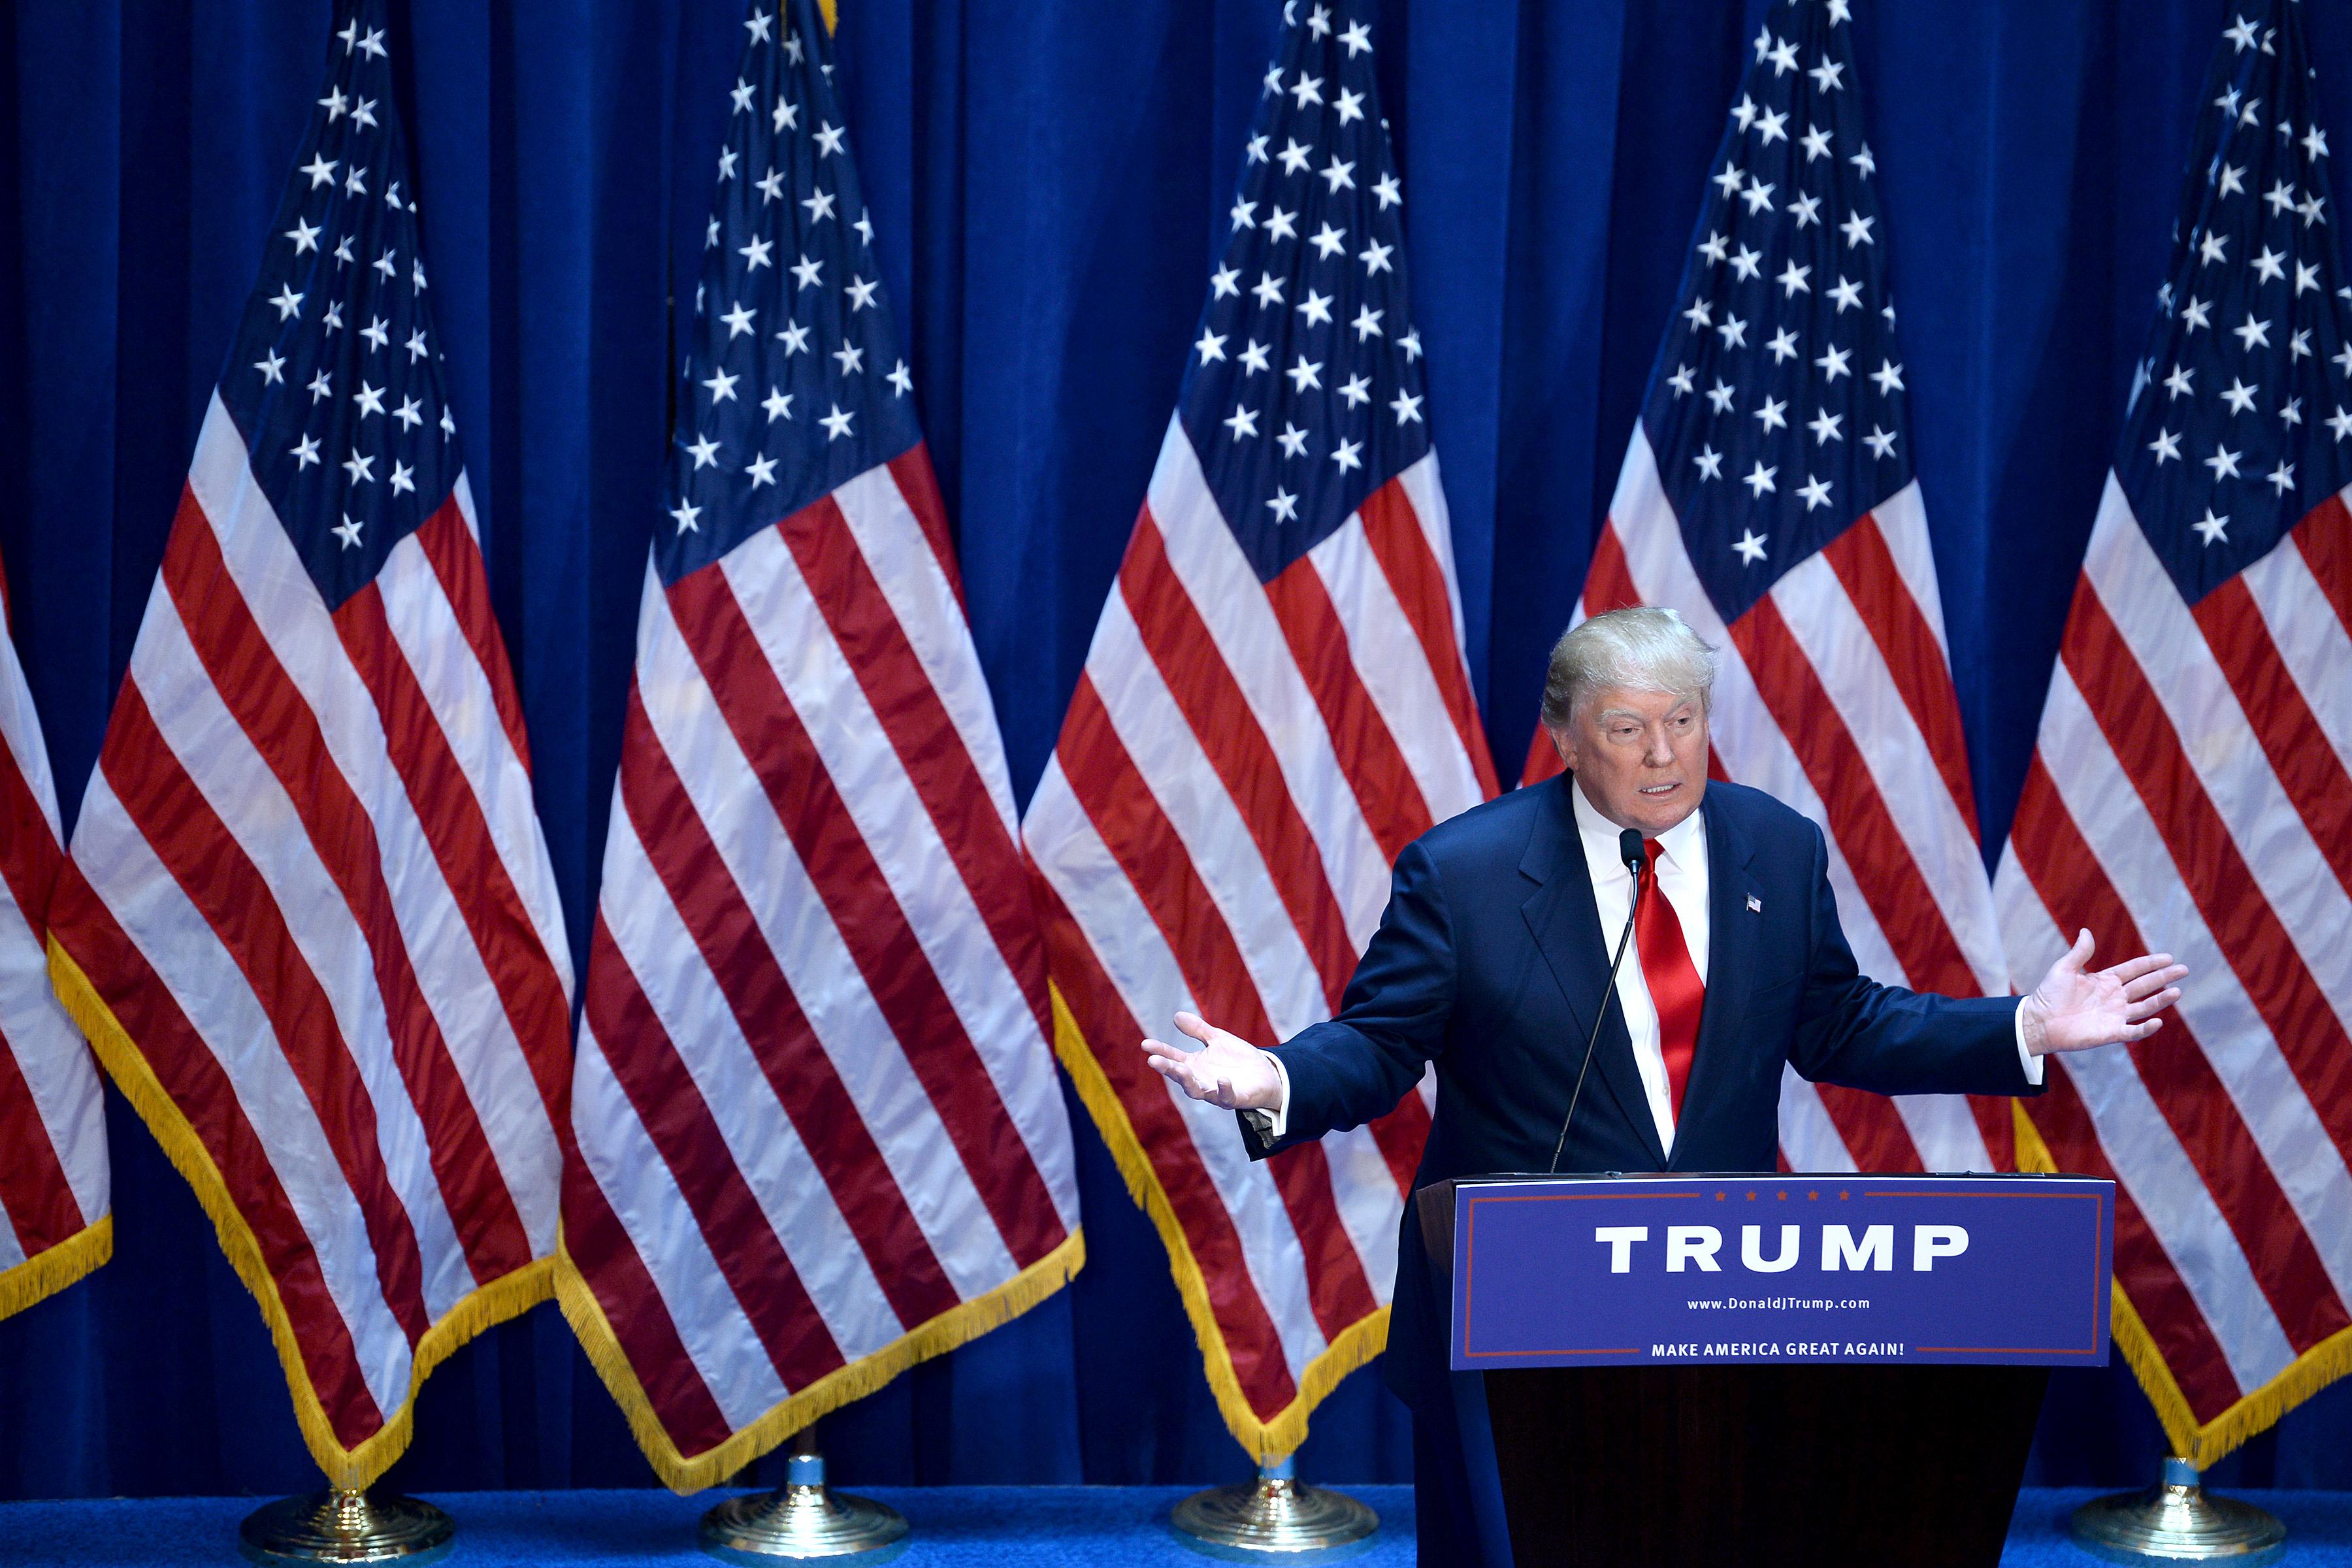 NY: Donald Trump Announces Presidential Run